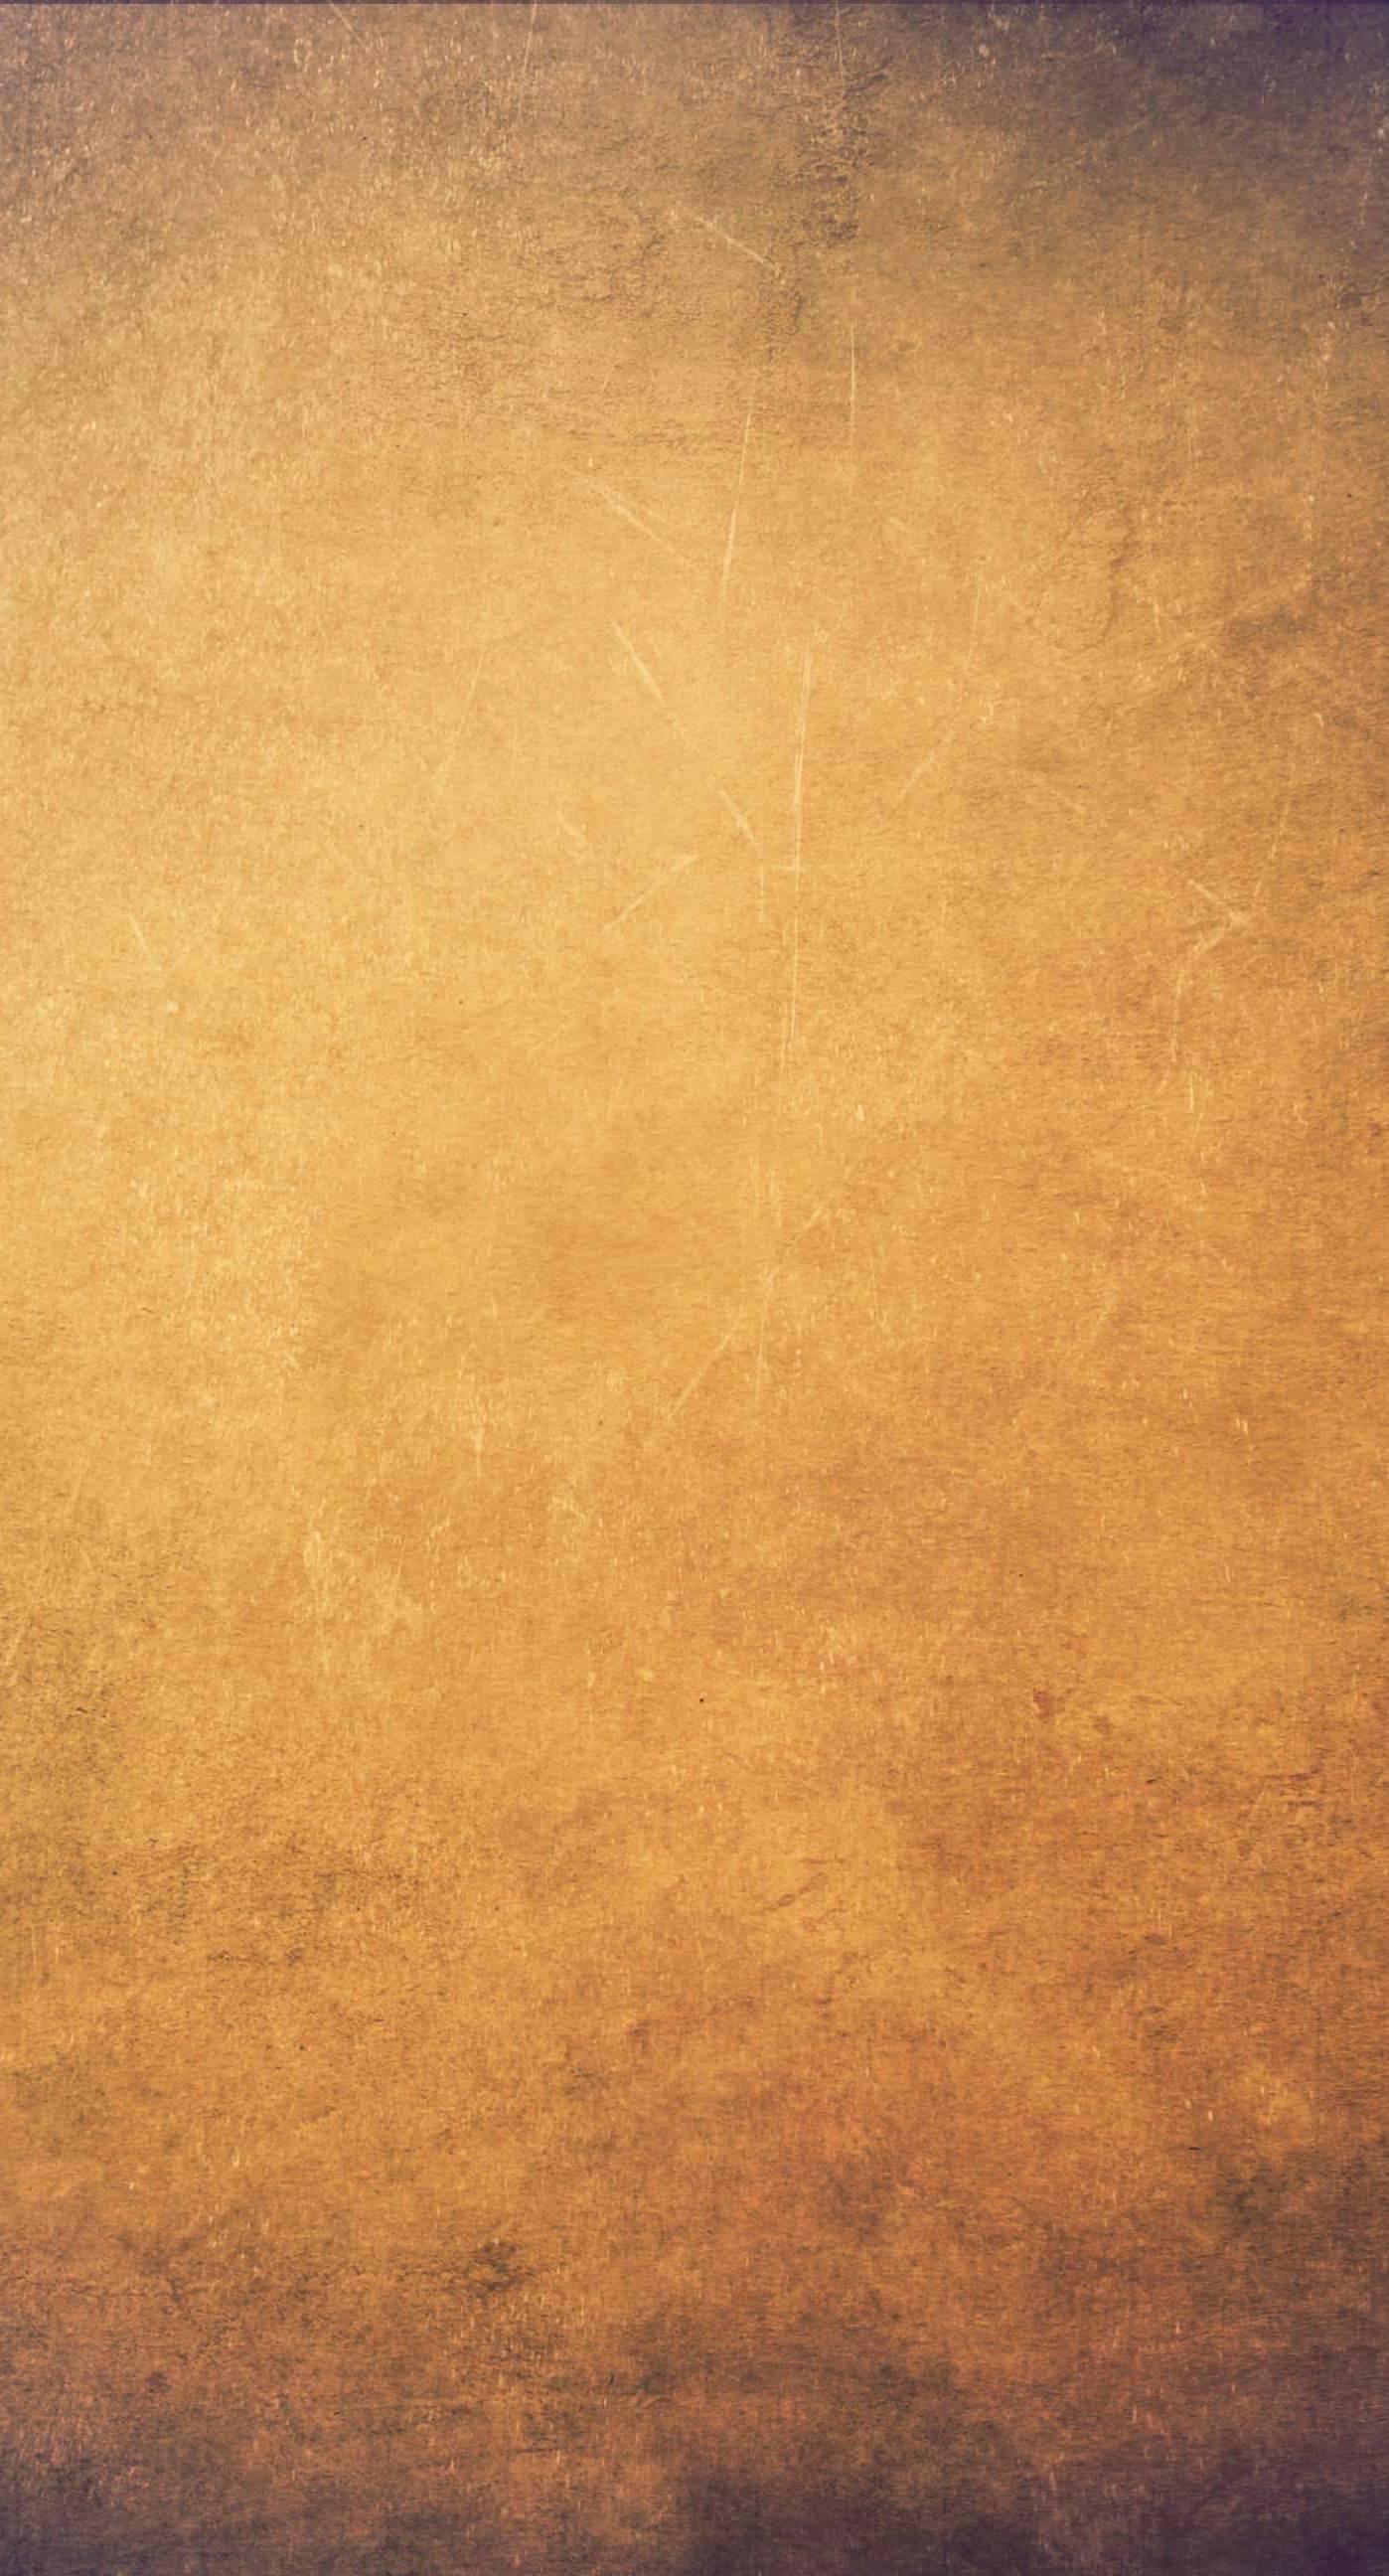 Wallpaper iphone gold - Pattern Black Gold Wallpaper Sc Iphone6plus